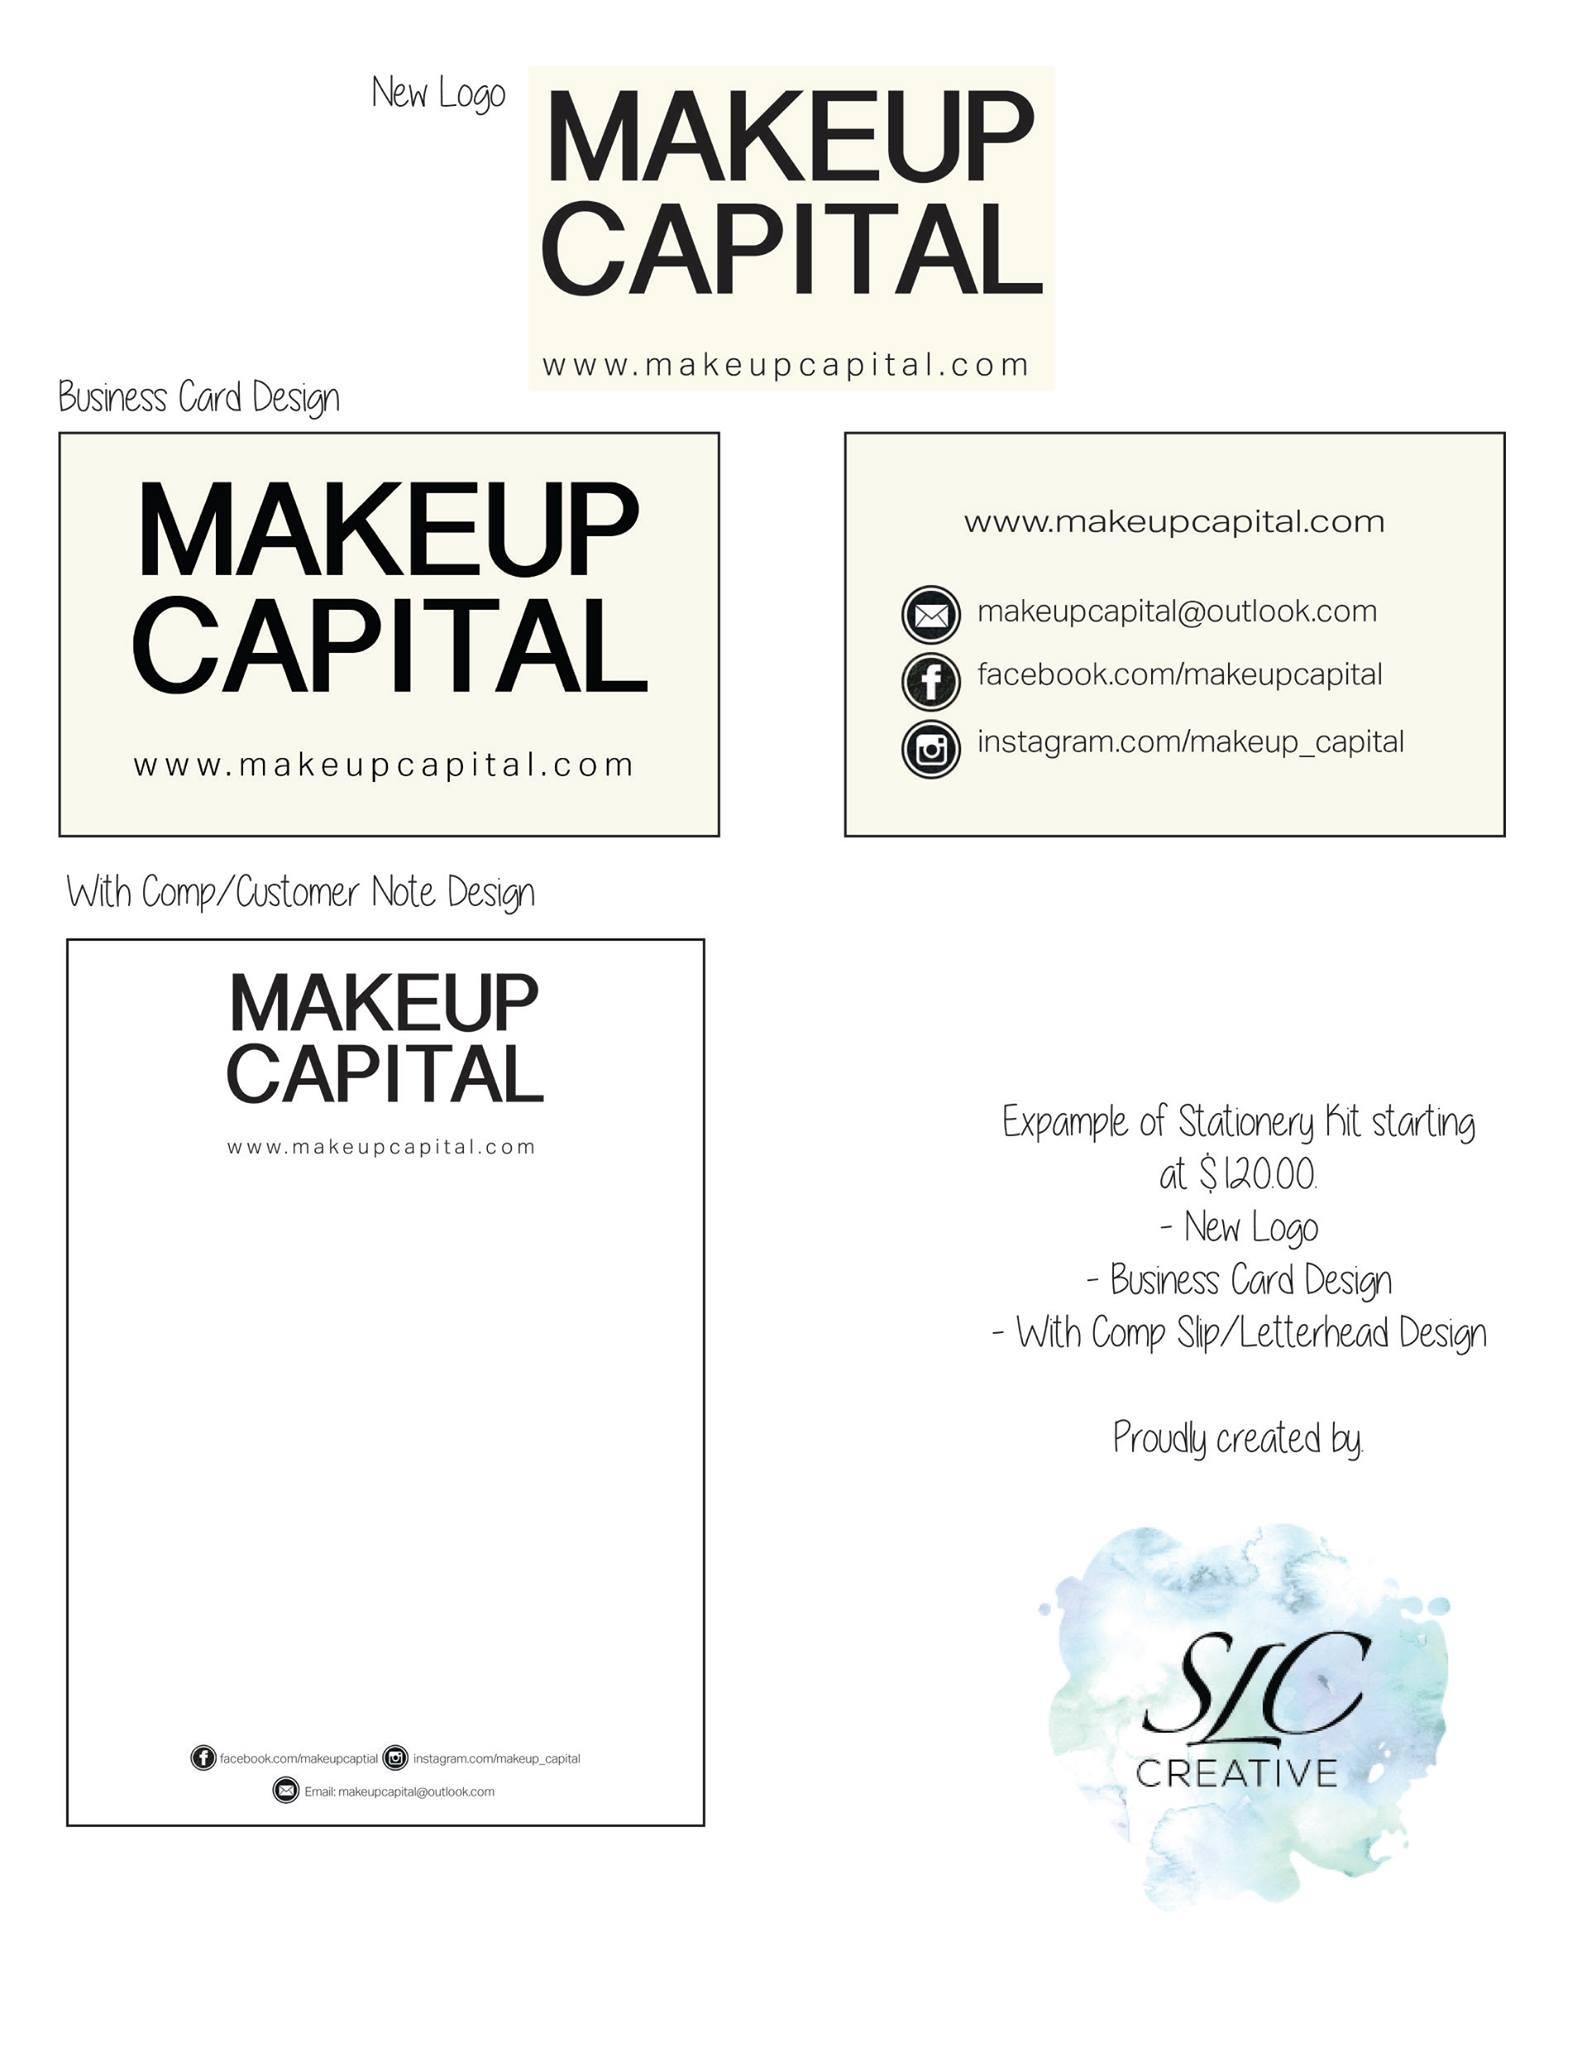 Makeup Capital Stationery